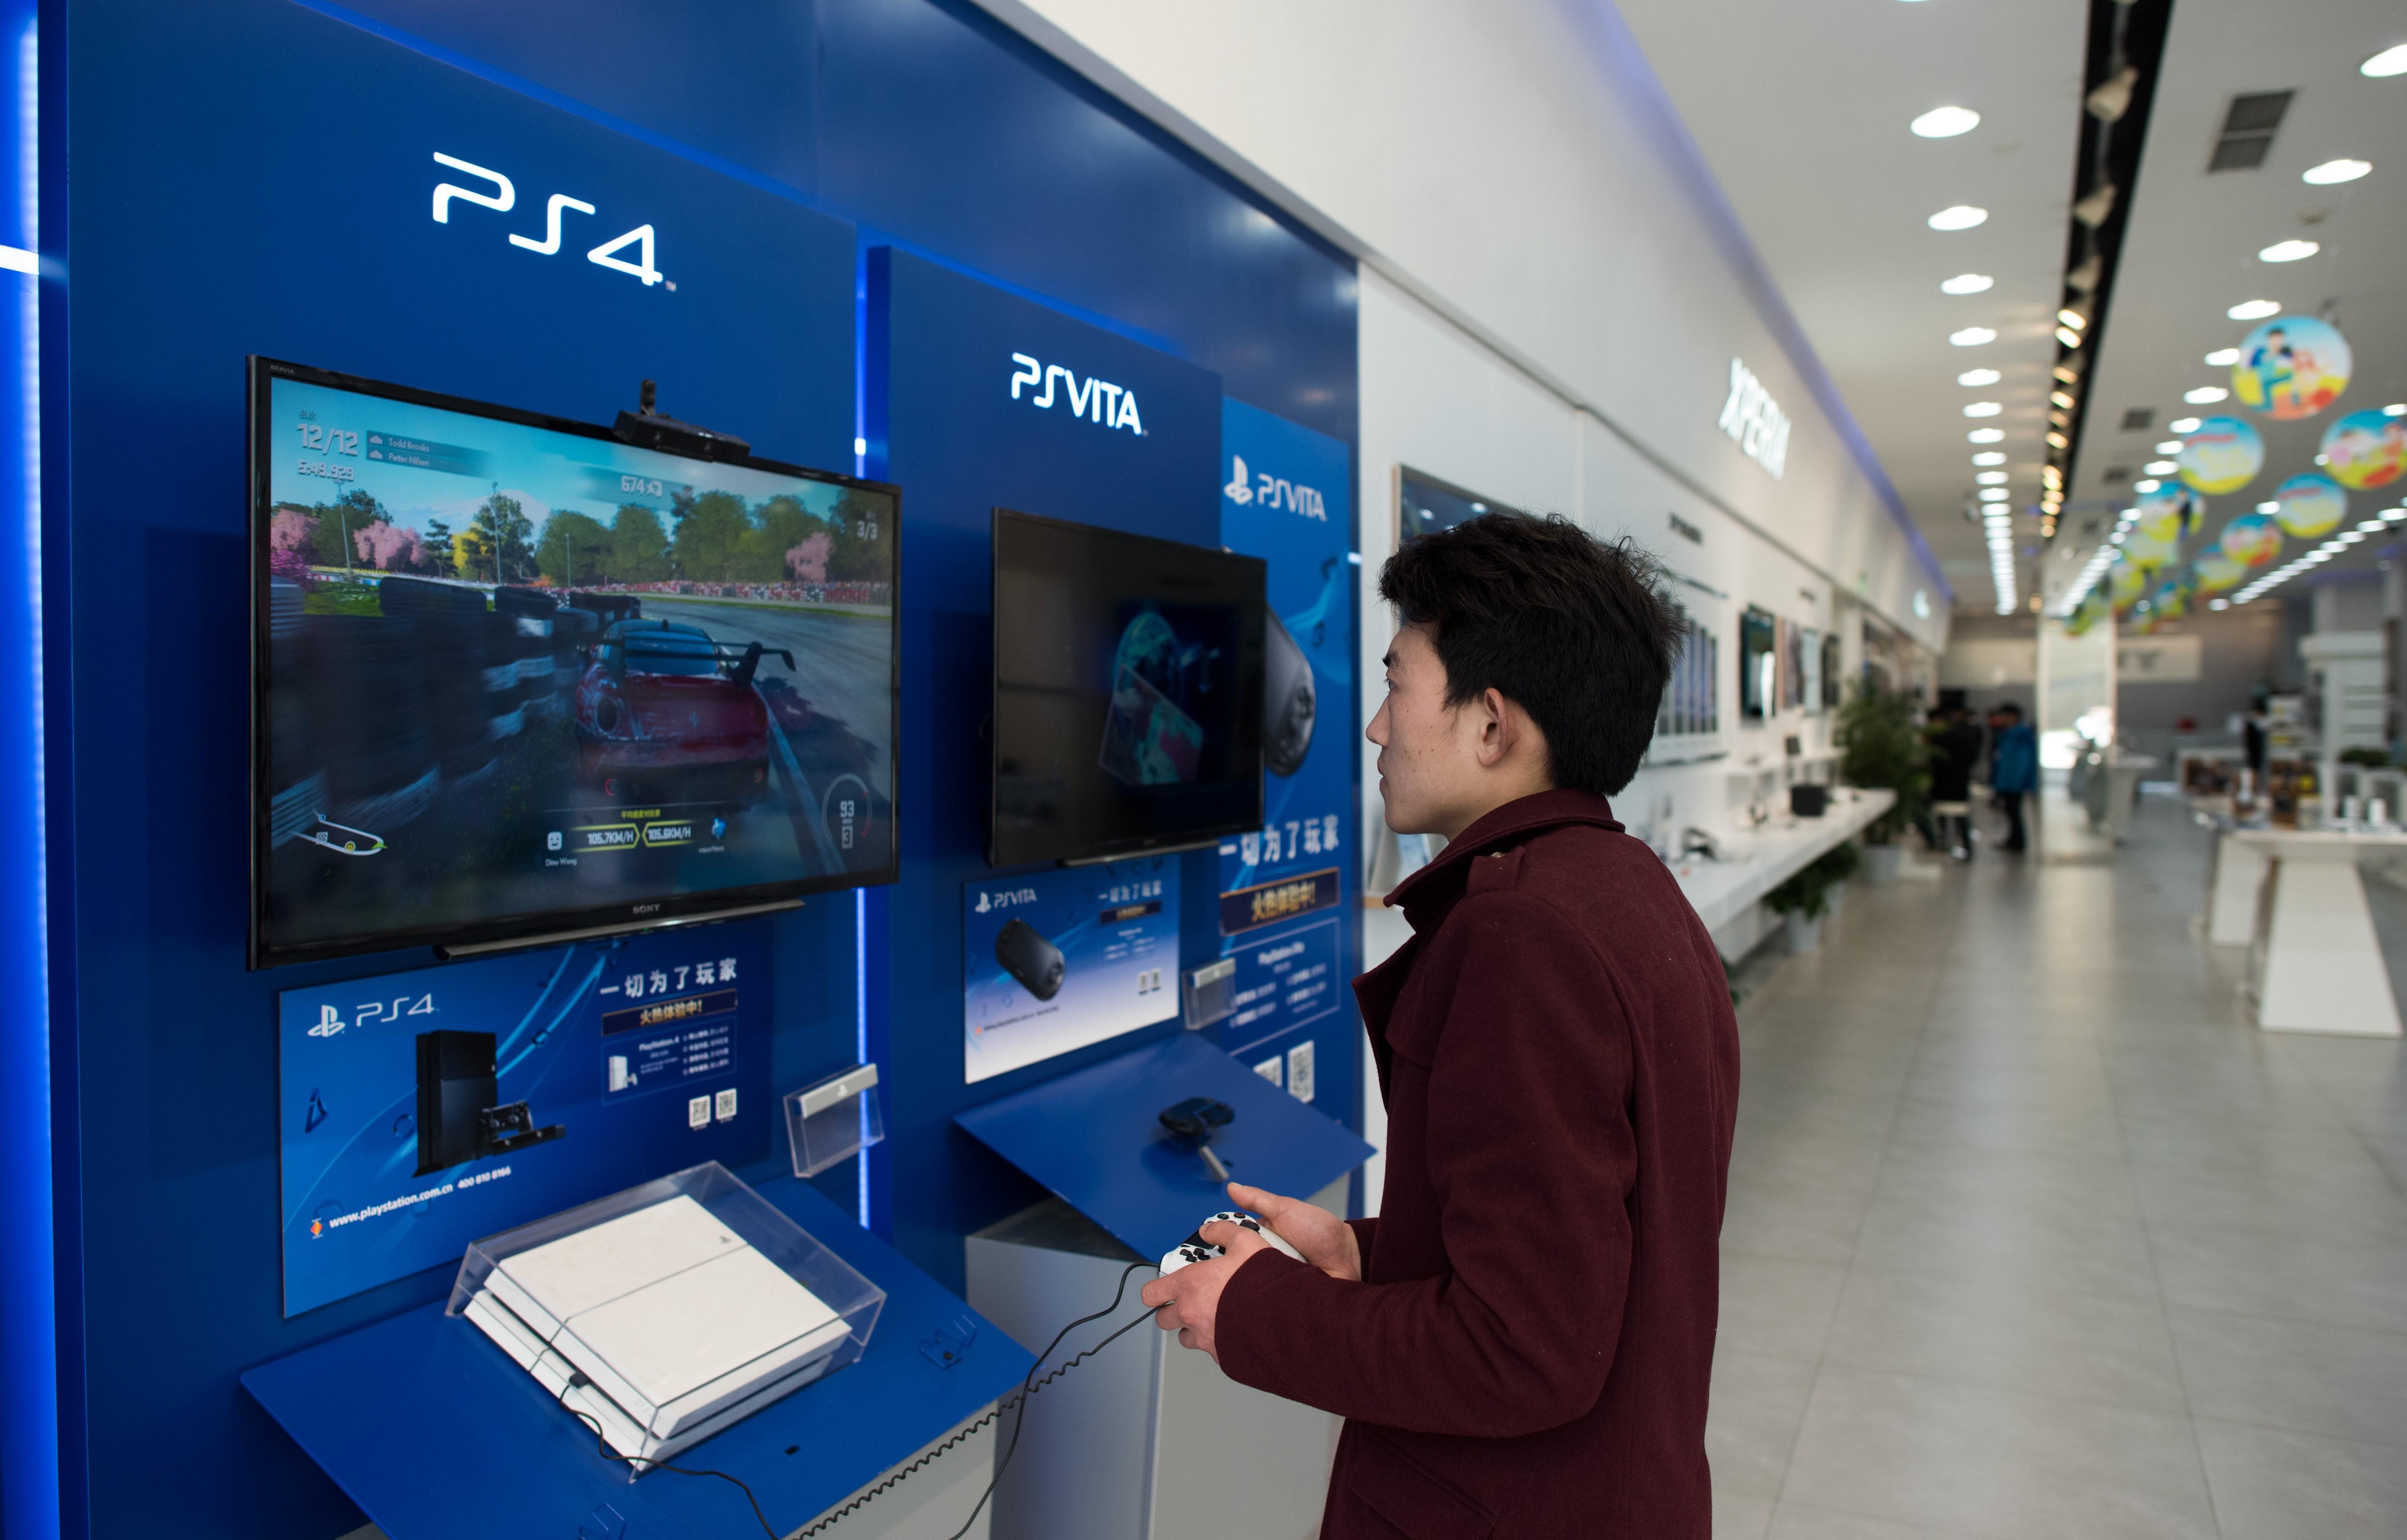 CHINA-JAPAN-SONY-GAMES